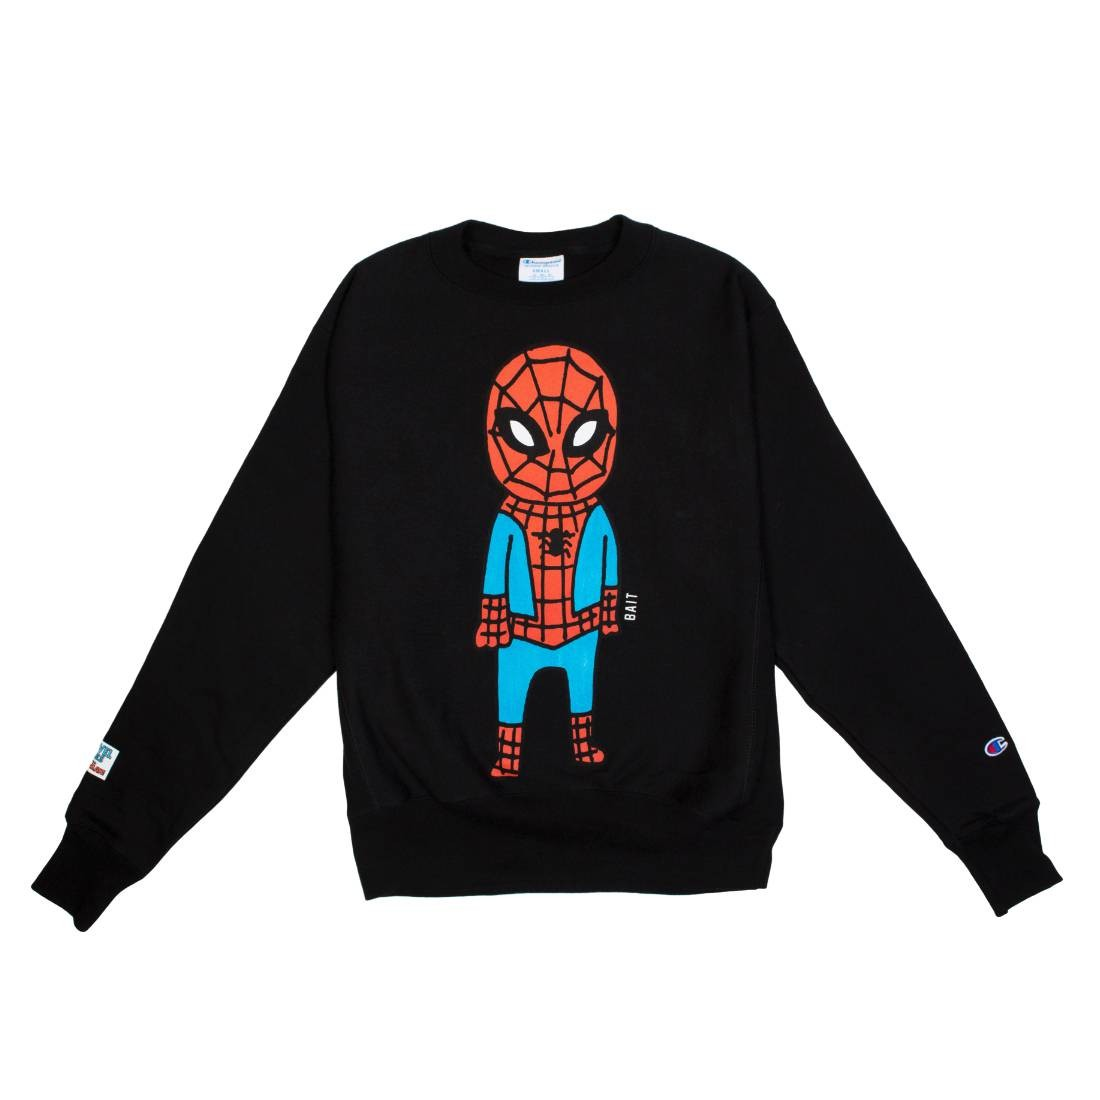 BAIT x Spiderman x Champion Men Spiderman Doodle Crewneck Sweater (black)